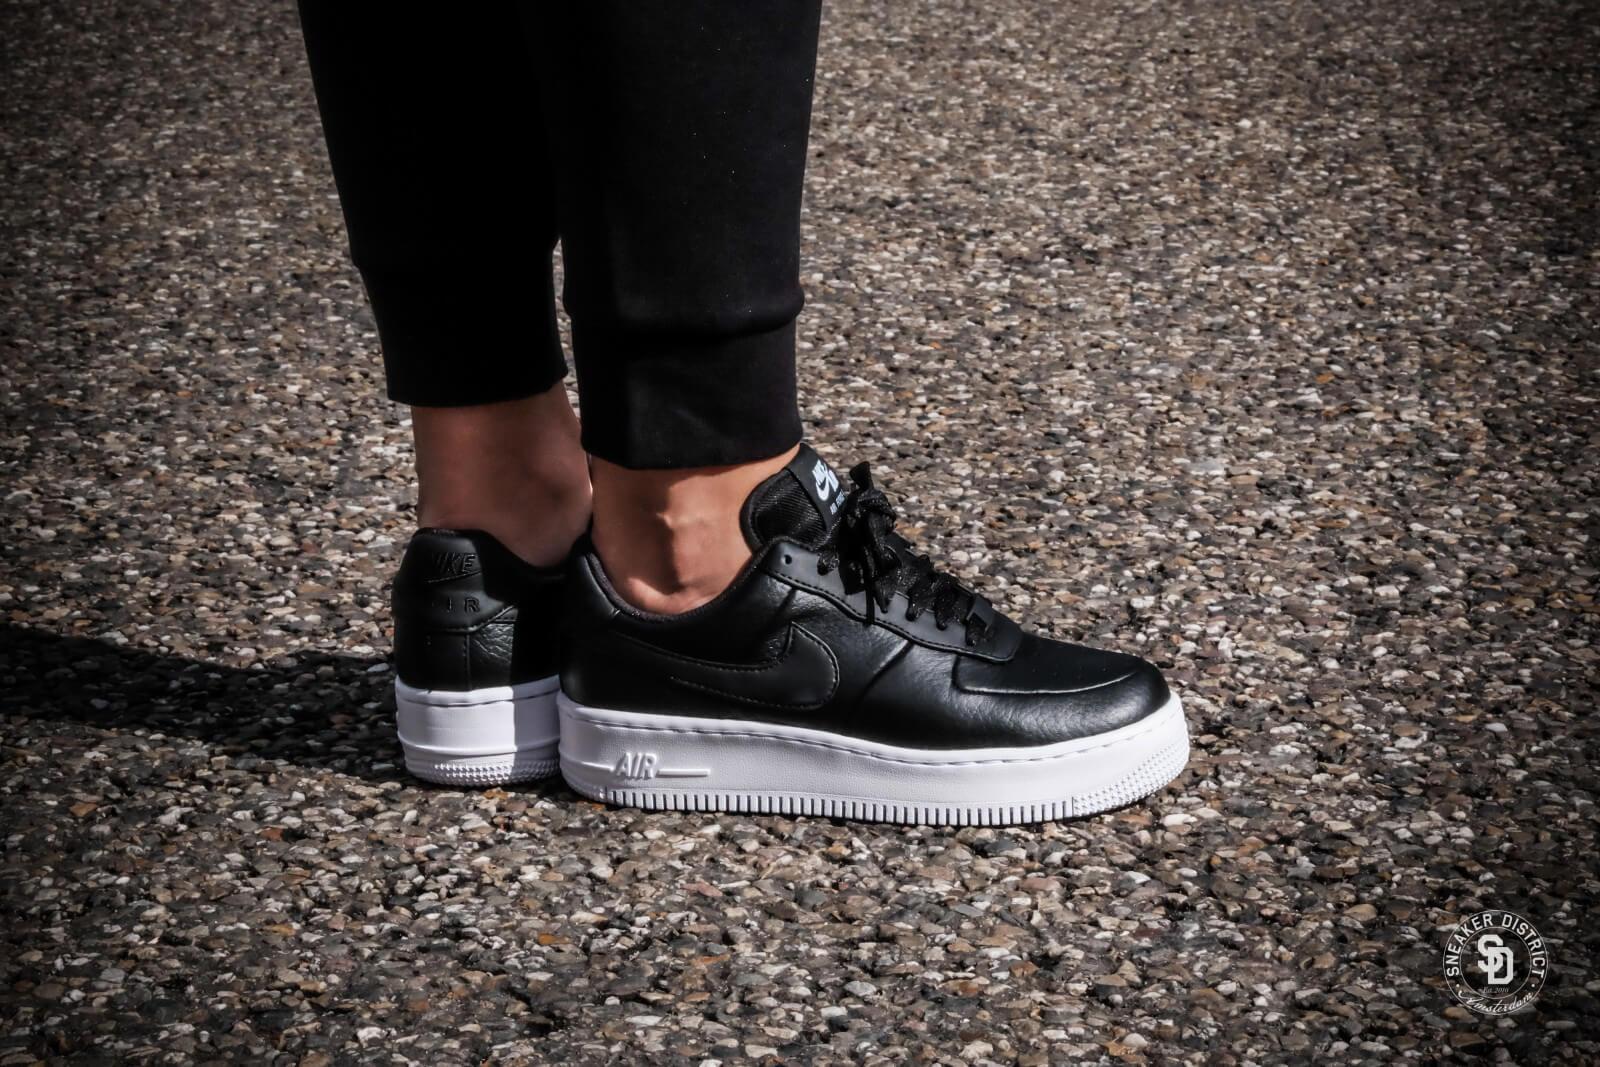 Nike WMNS Air Force 1 Low Upstep BR - Black